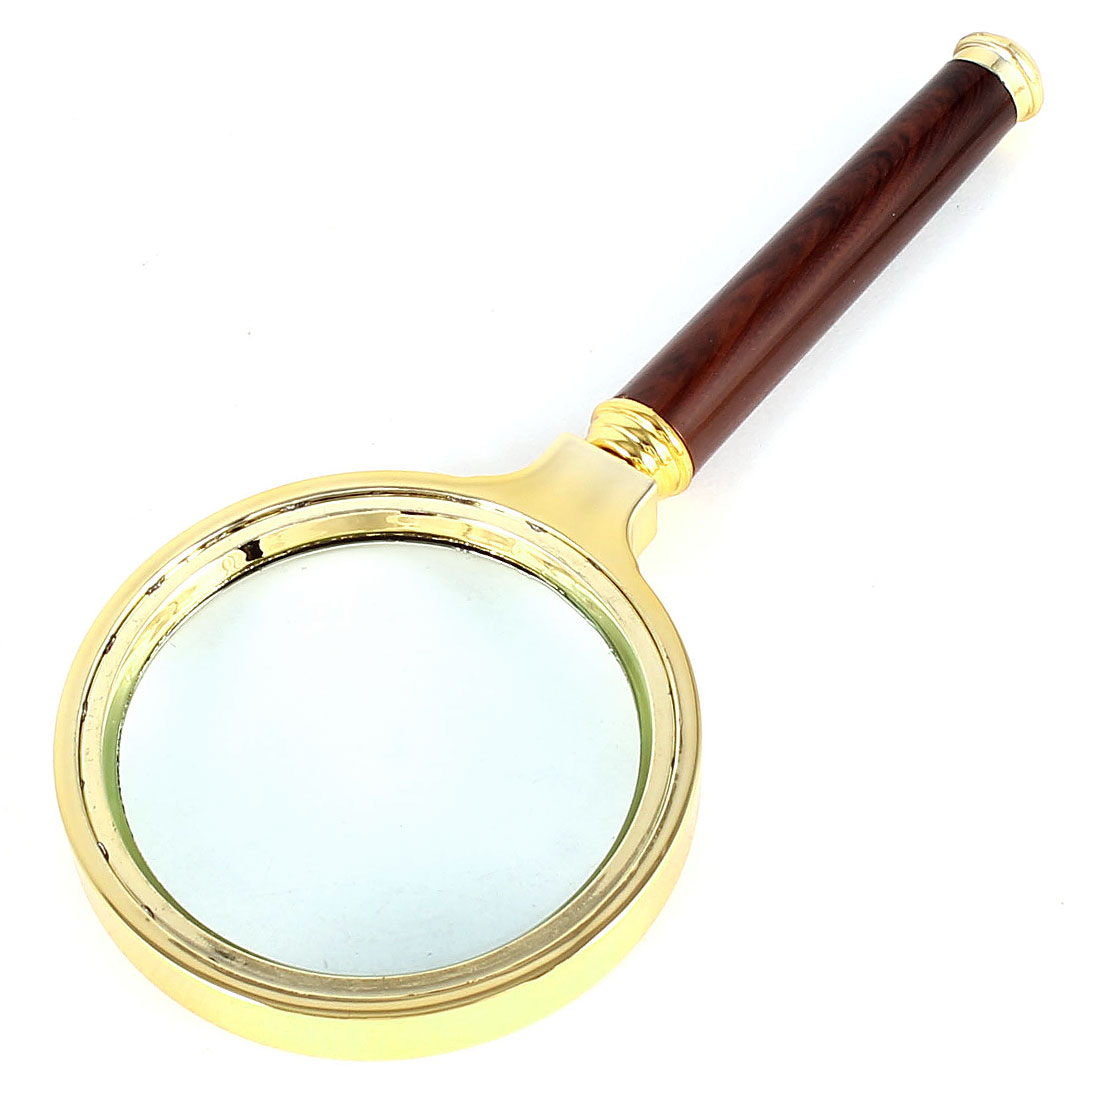 Detachable Grip 70mm Diameter 4X Clear Optical Lens Magnifying Glass Metal